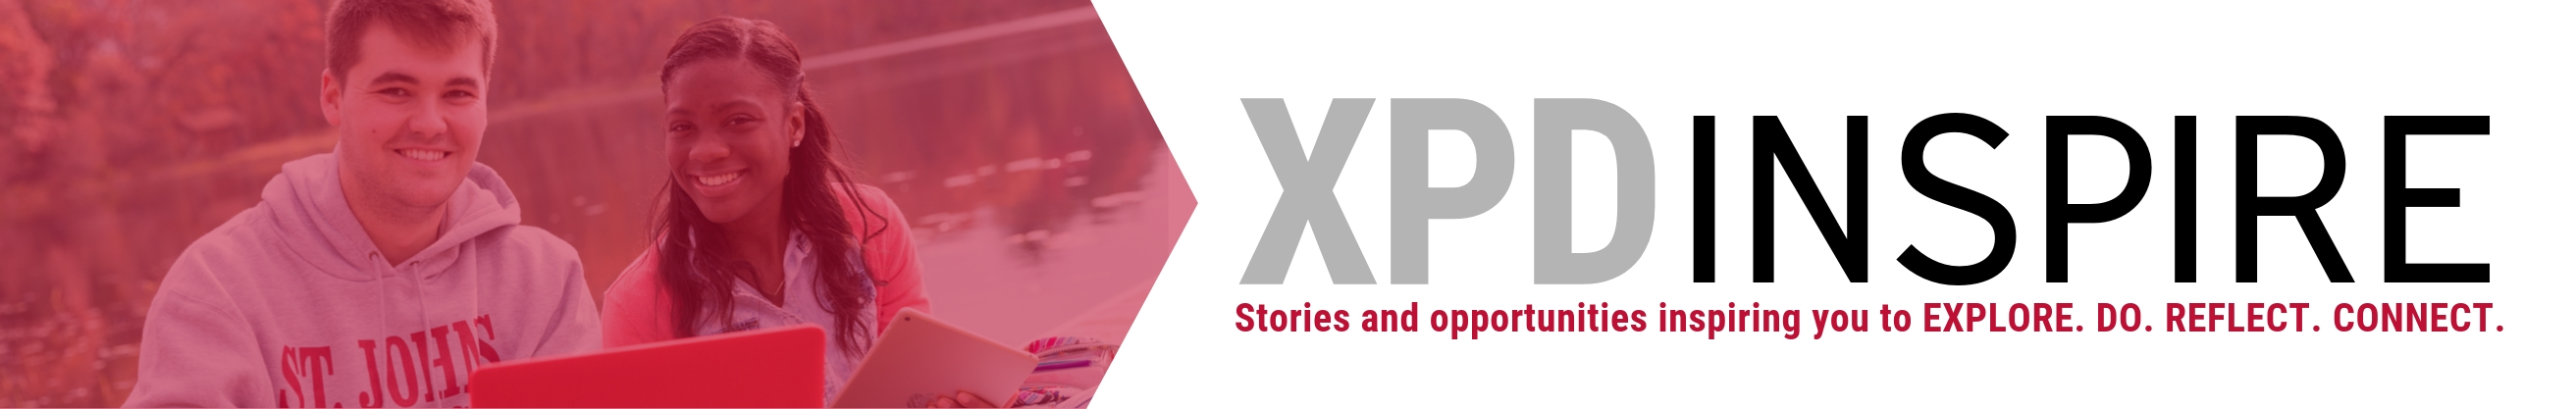 2019 XPDInspire header 2